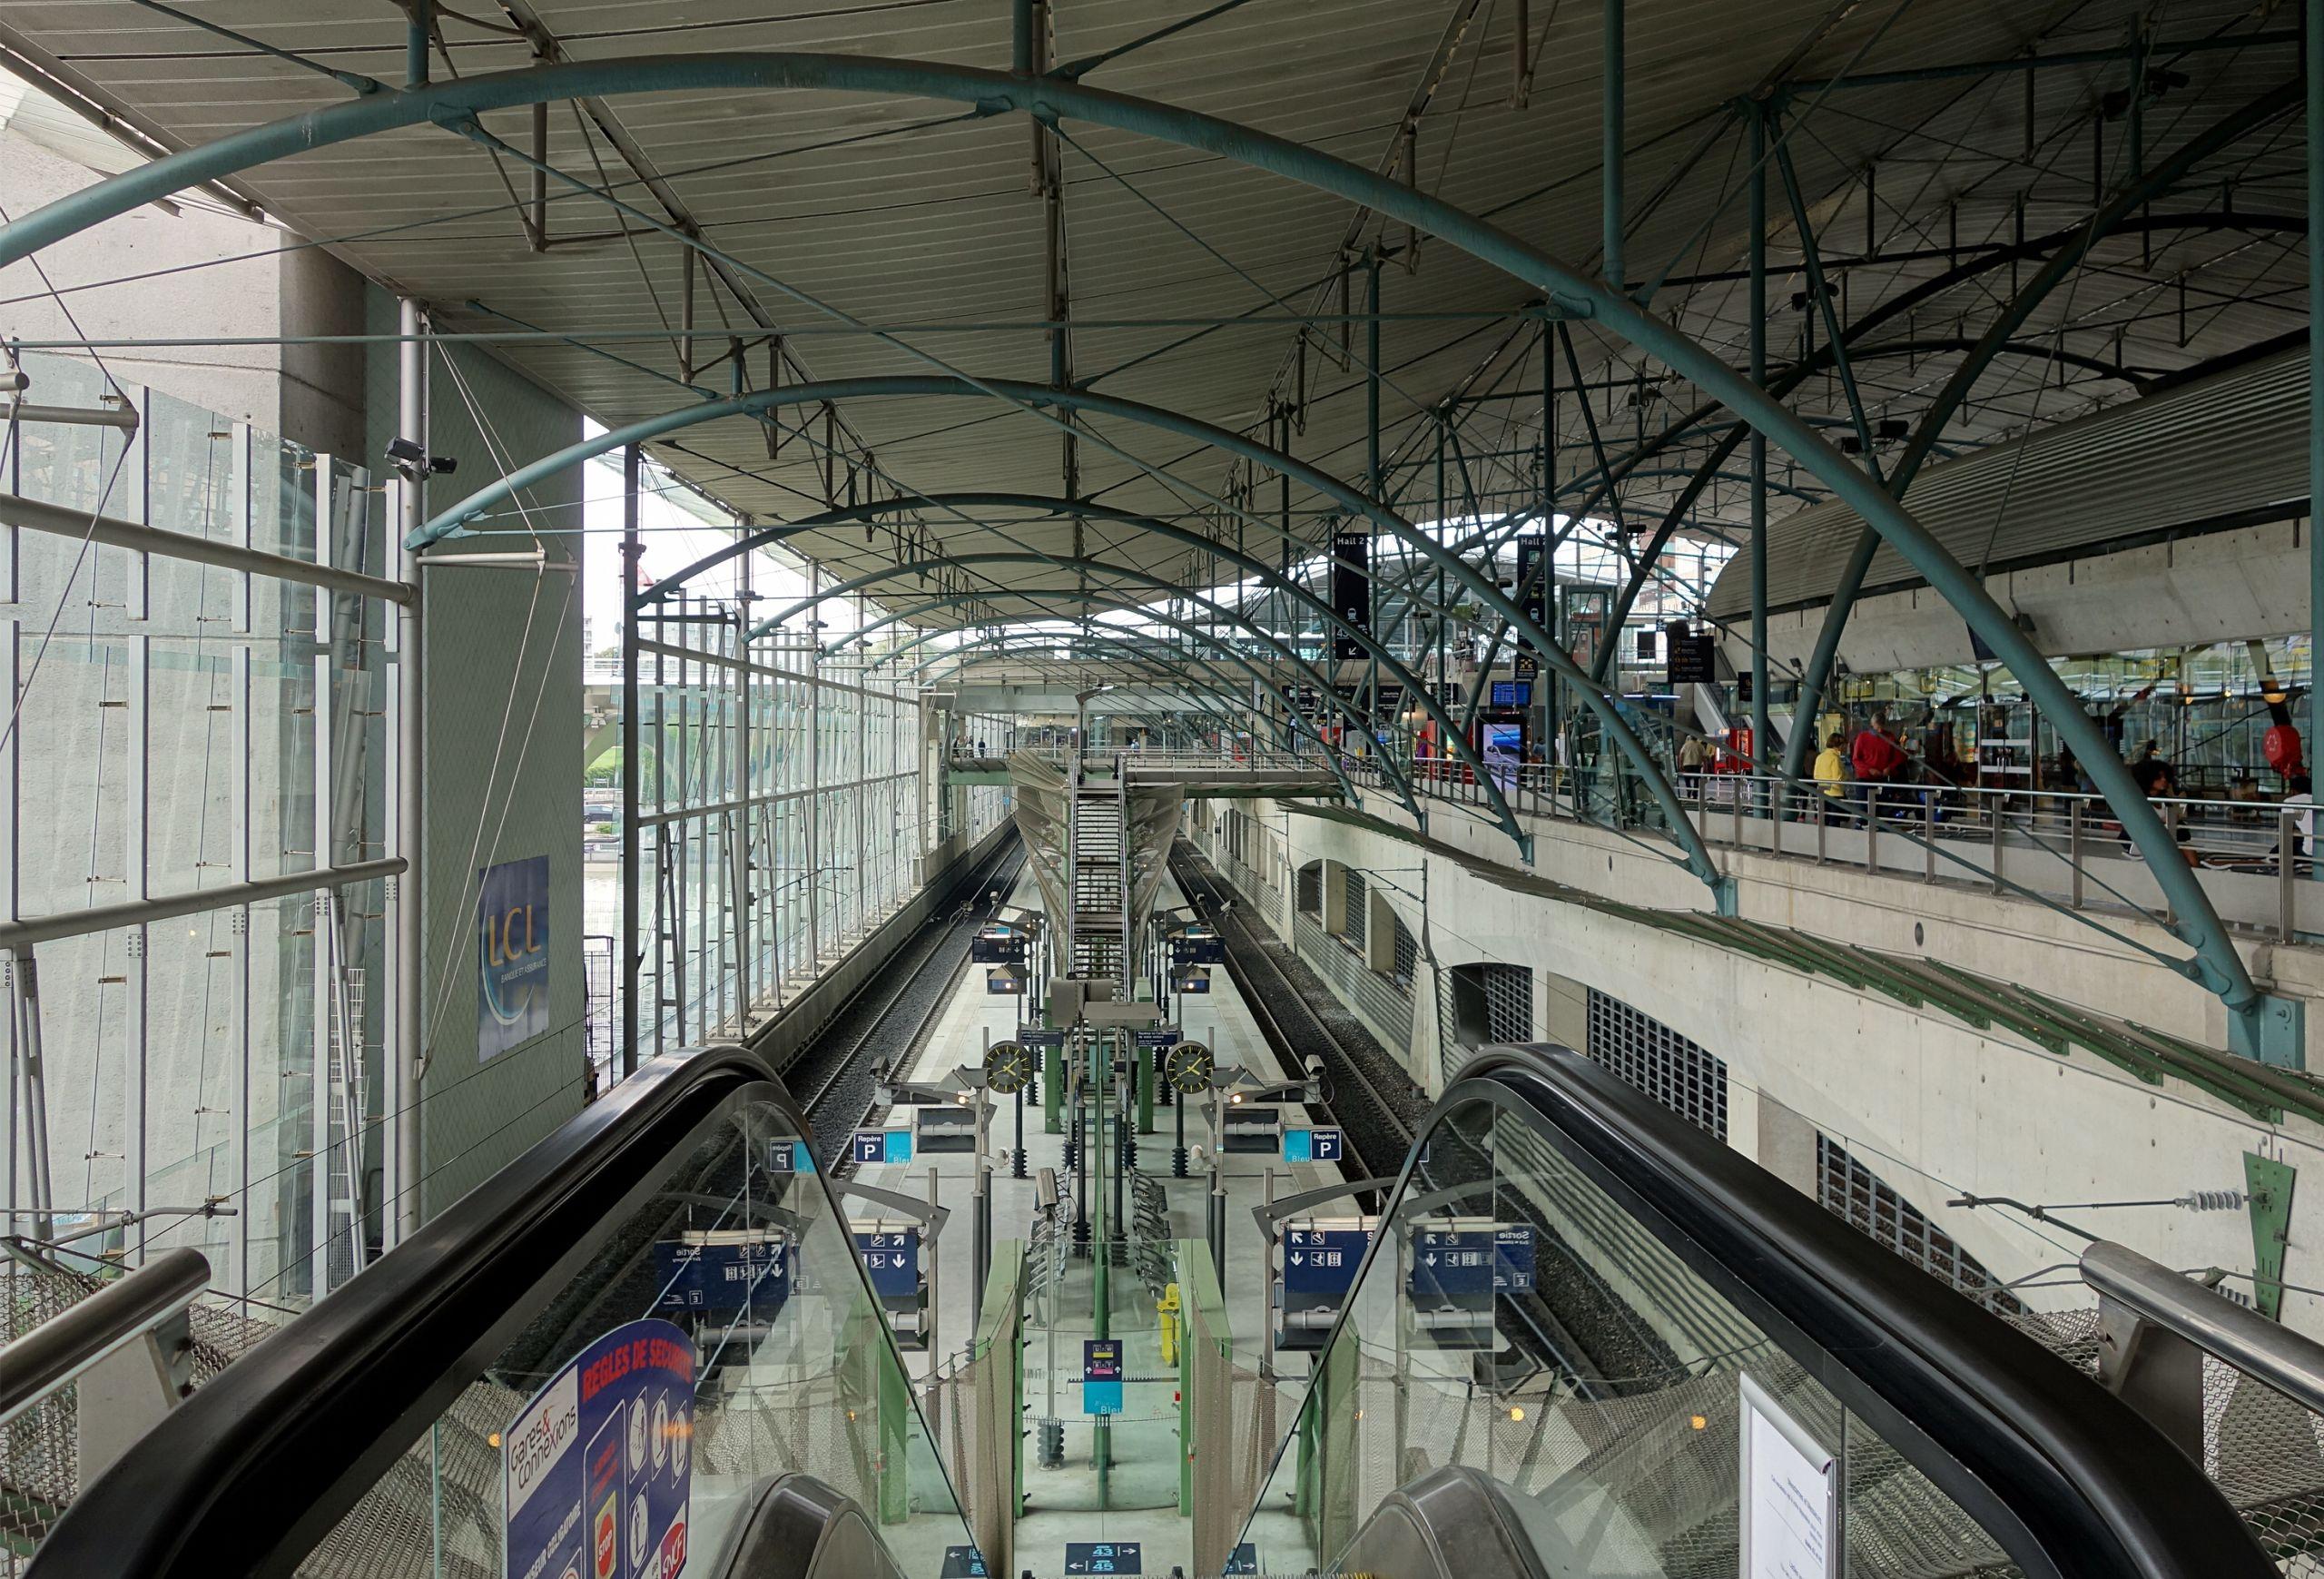 Lille europe gare JPG